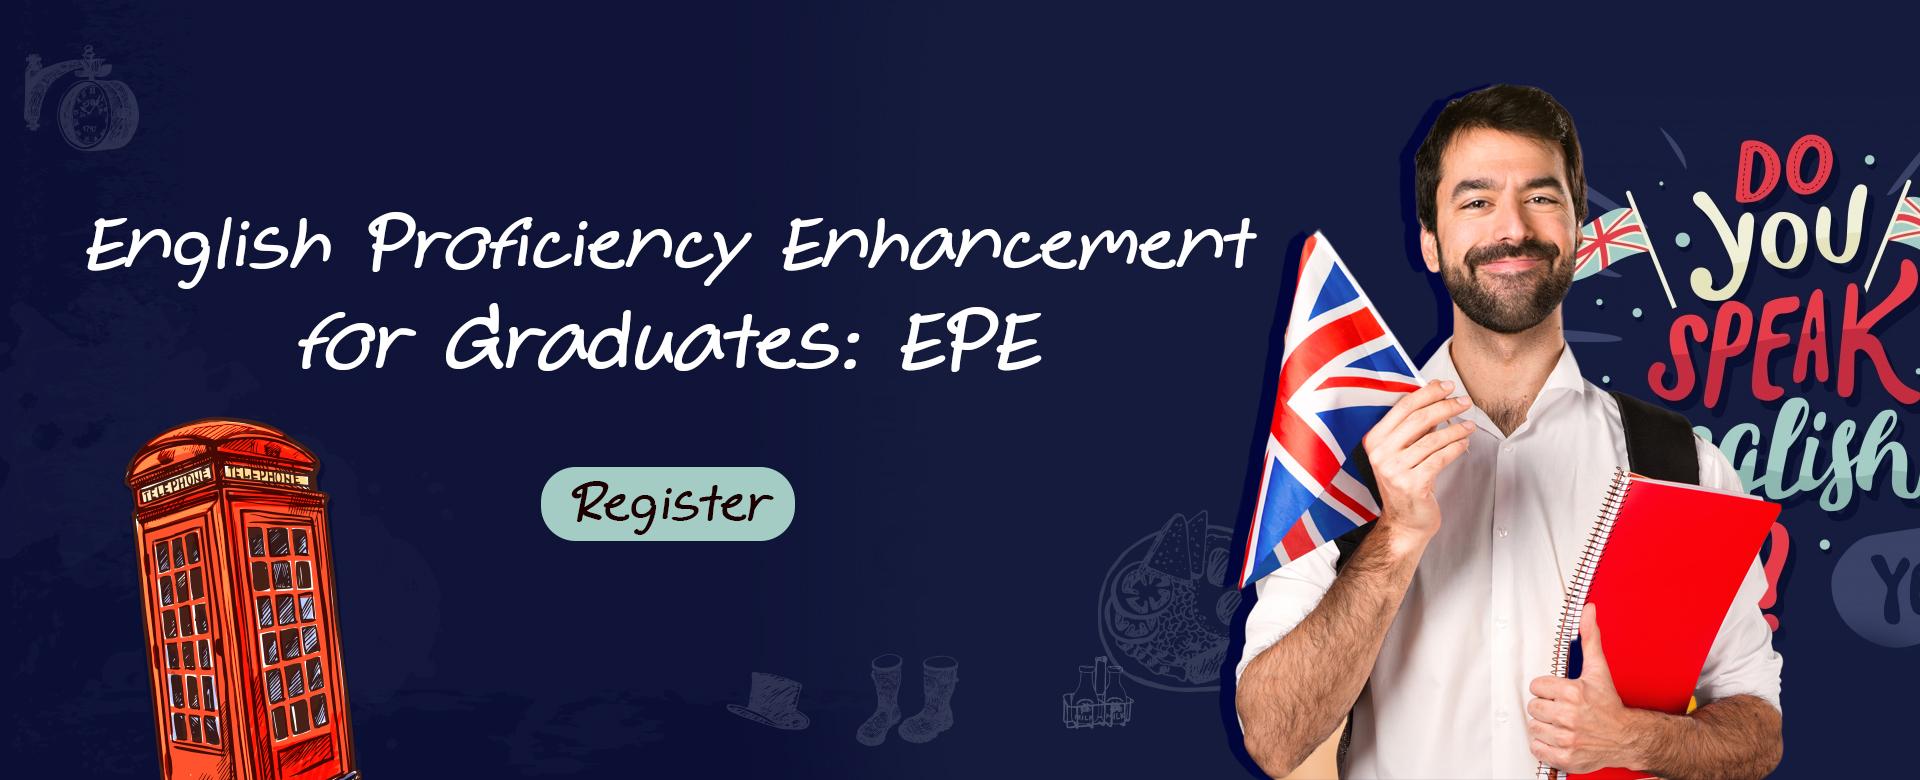 EPE Open